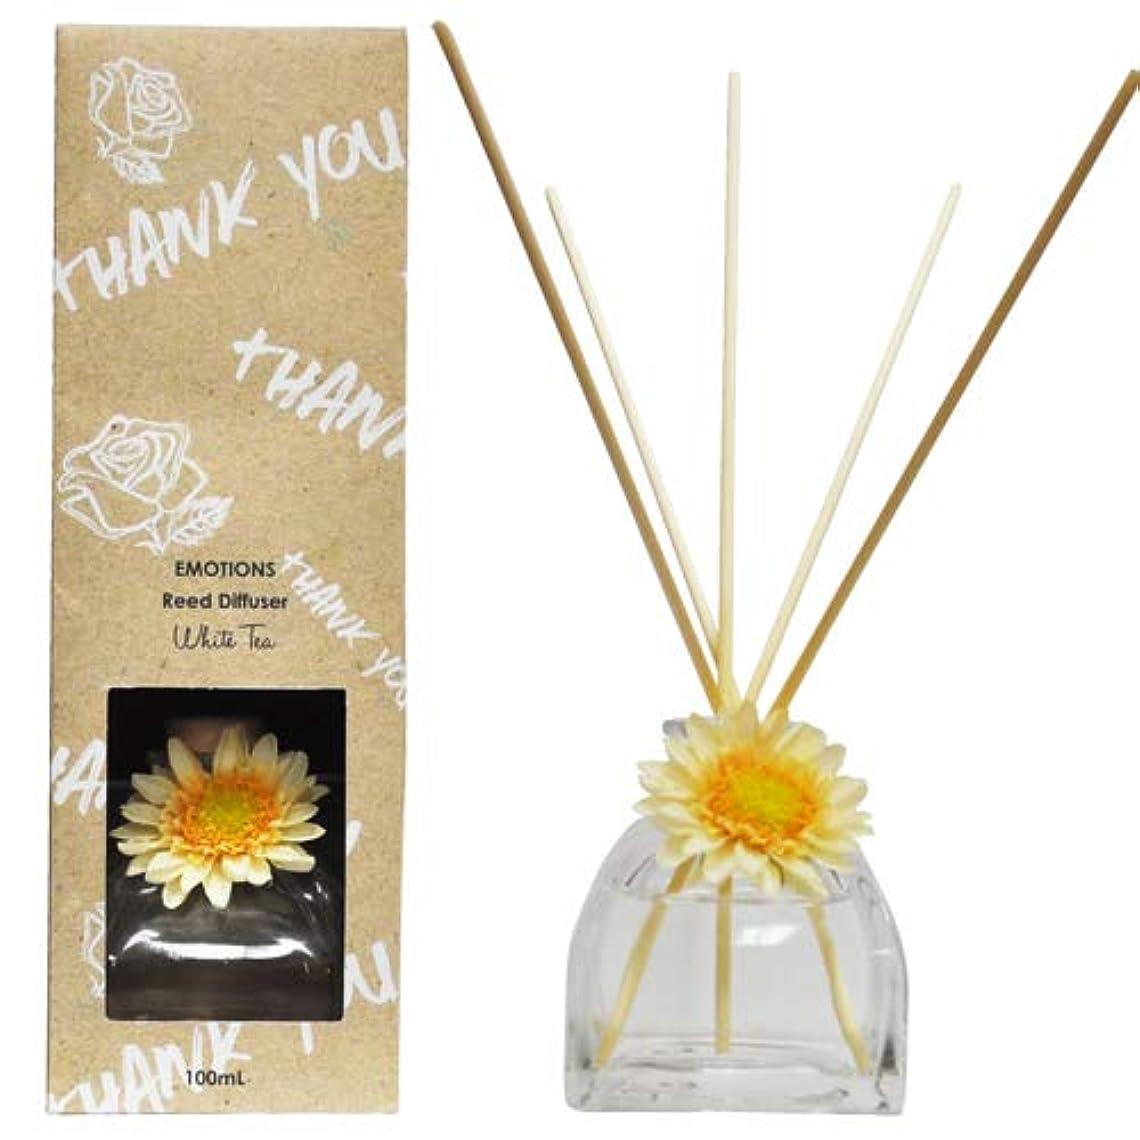 EMOTIONS エモーション Fibre Reed Diffuser リードディフューザー Thank You サンキュー(White Tea ホワイトティ)